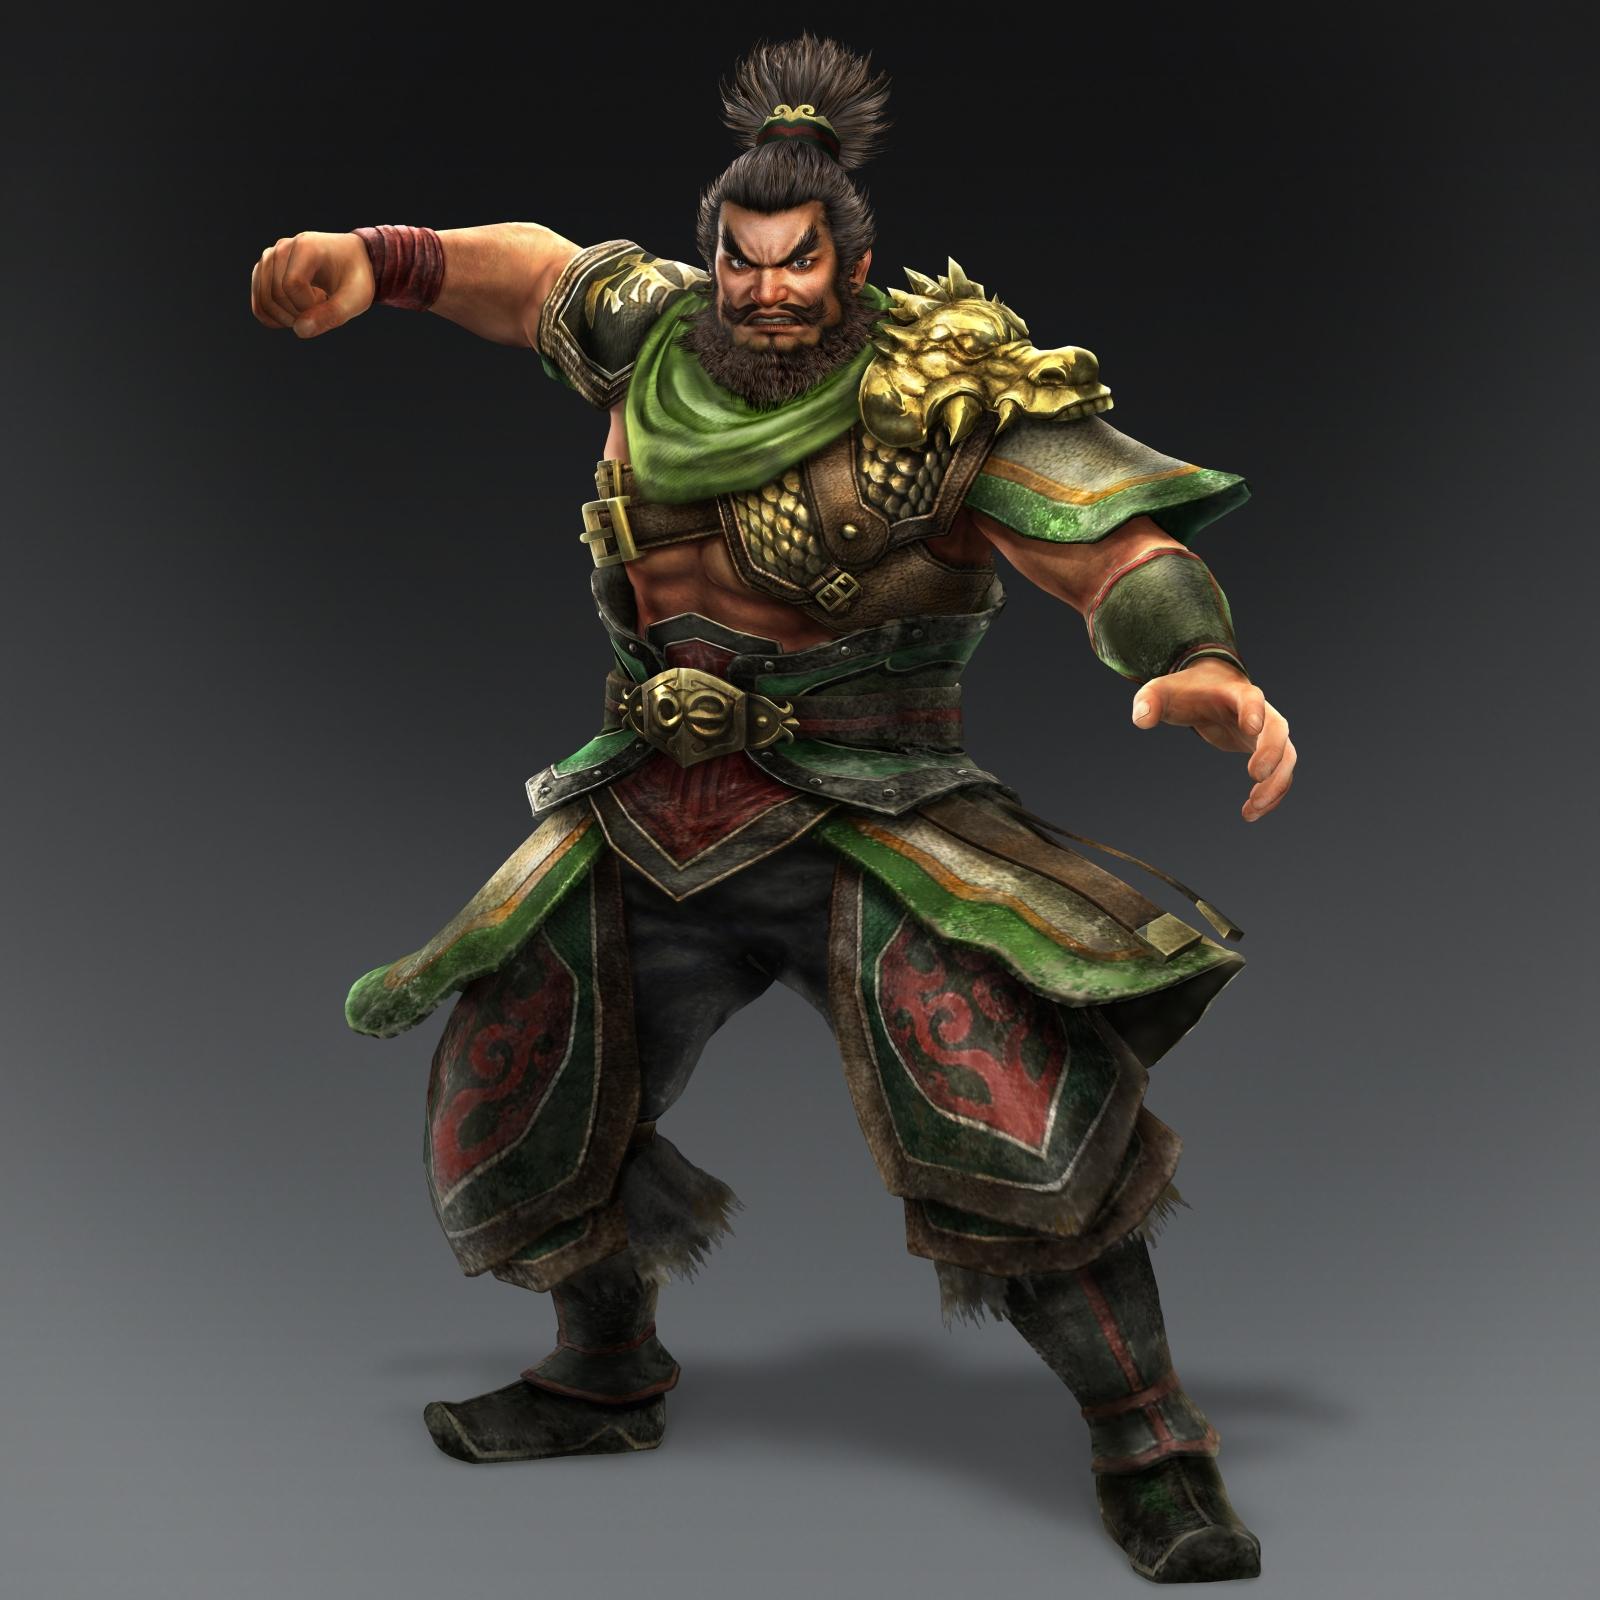 Dynasty Warriors 8 screens show off Jin stars - VG247